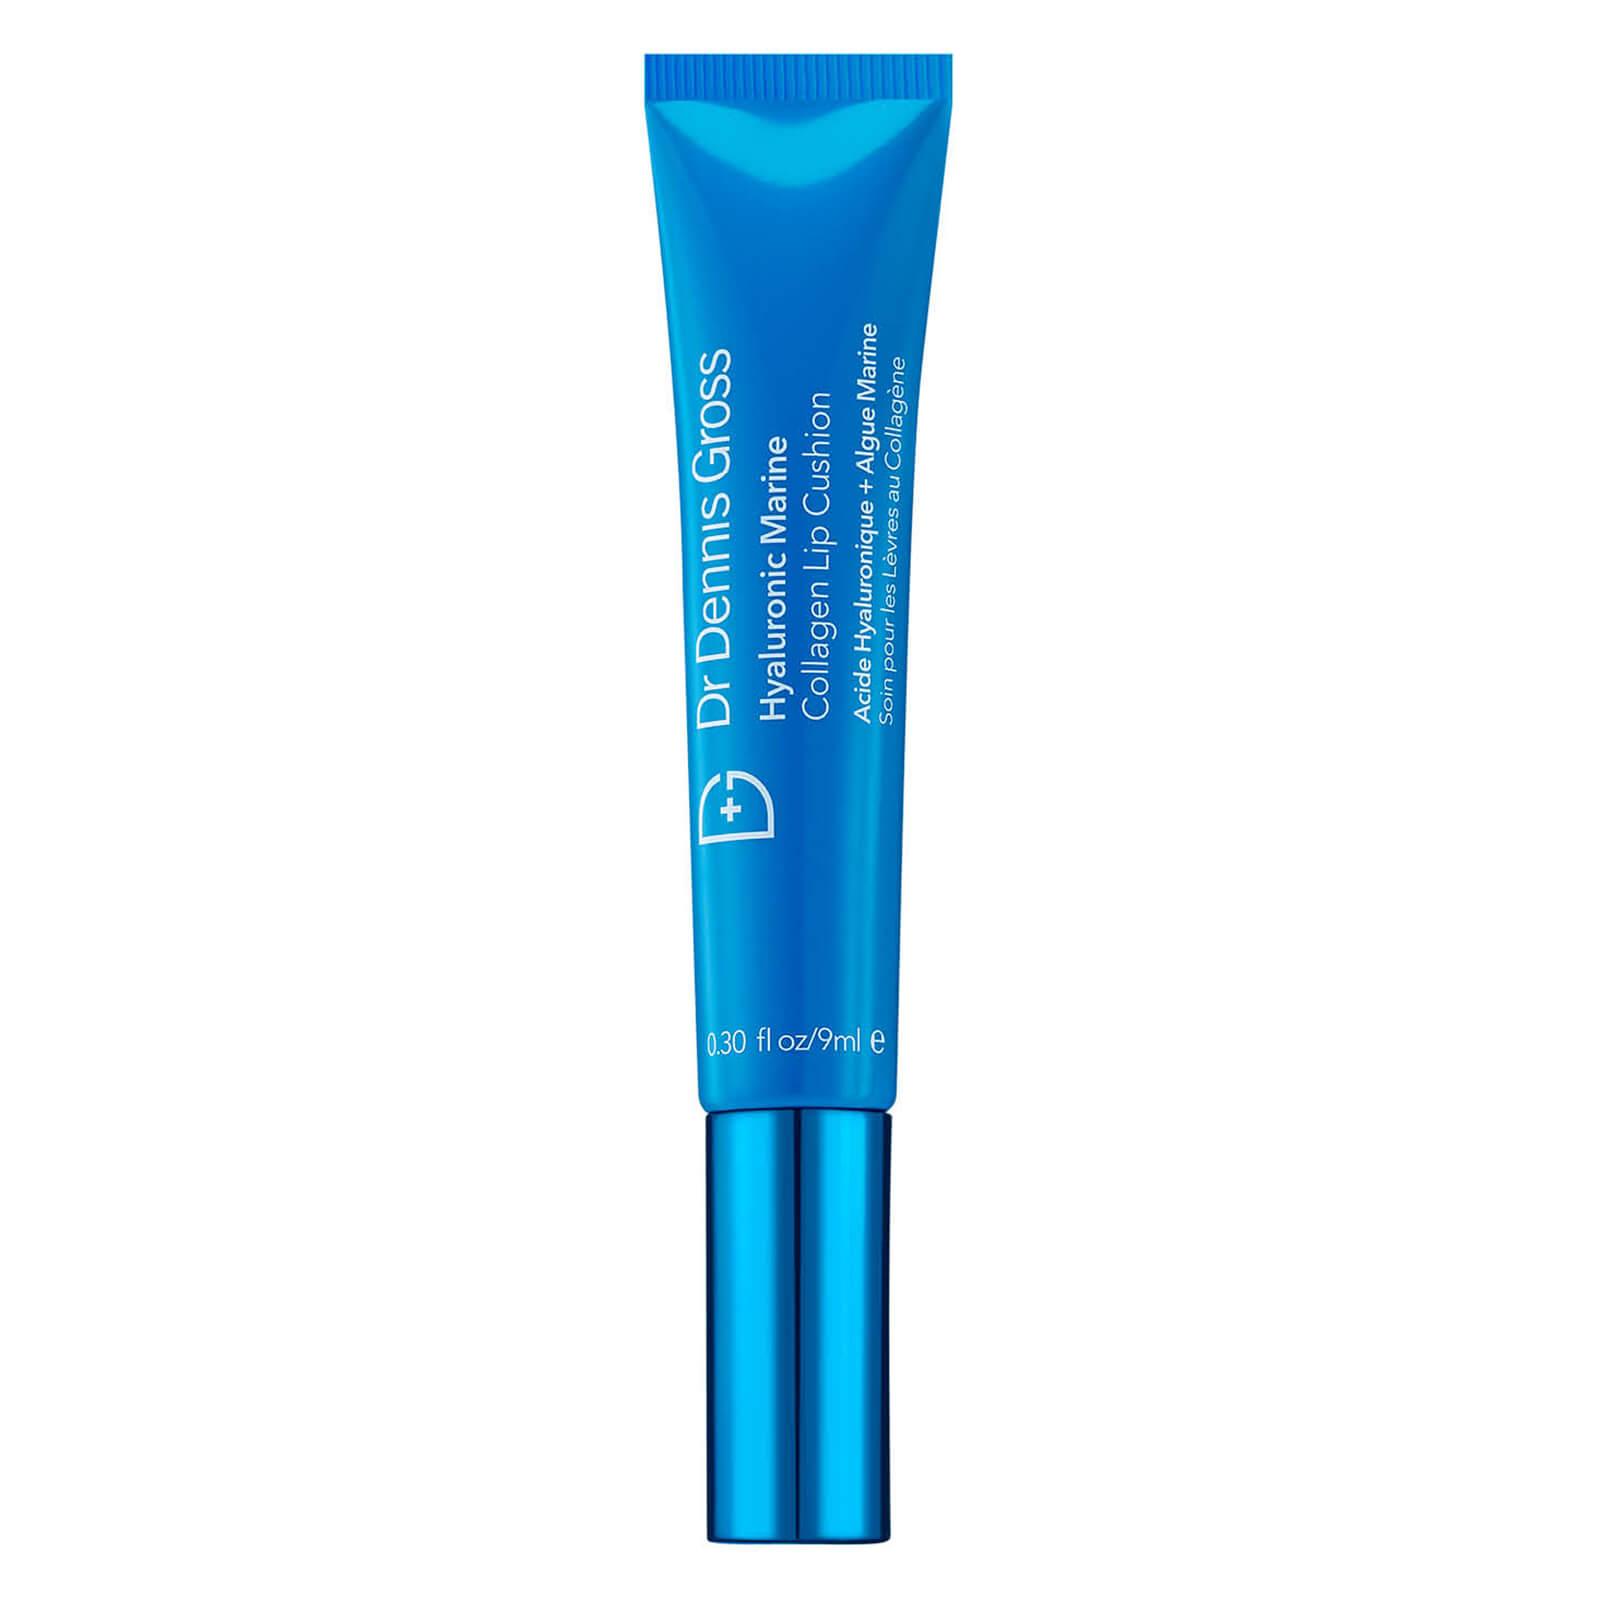 Купить Dr Dennis Gross Skincare Hyaluronic Marine Collagen Lip Cushion 9ml